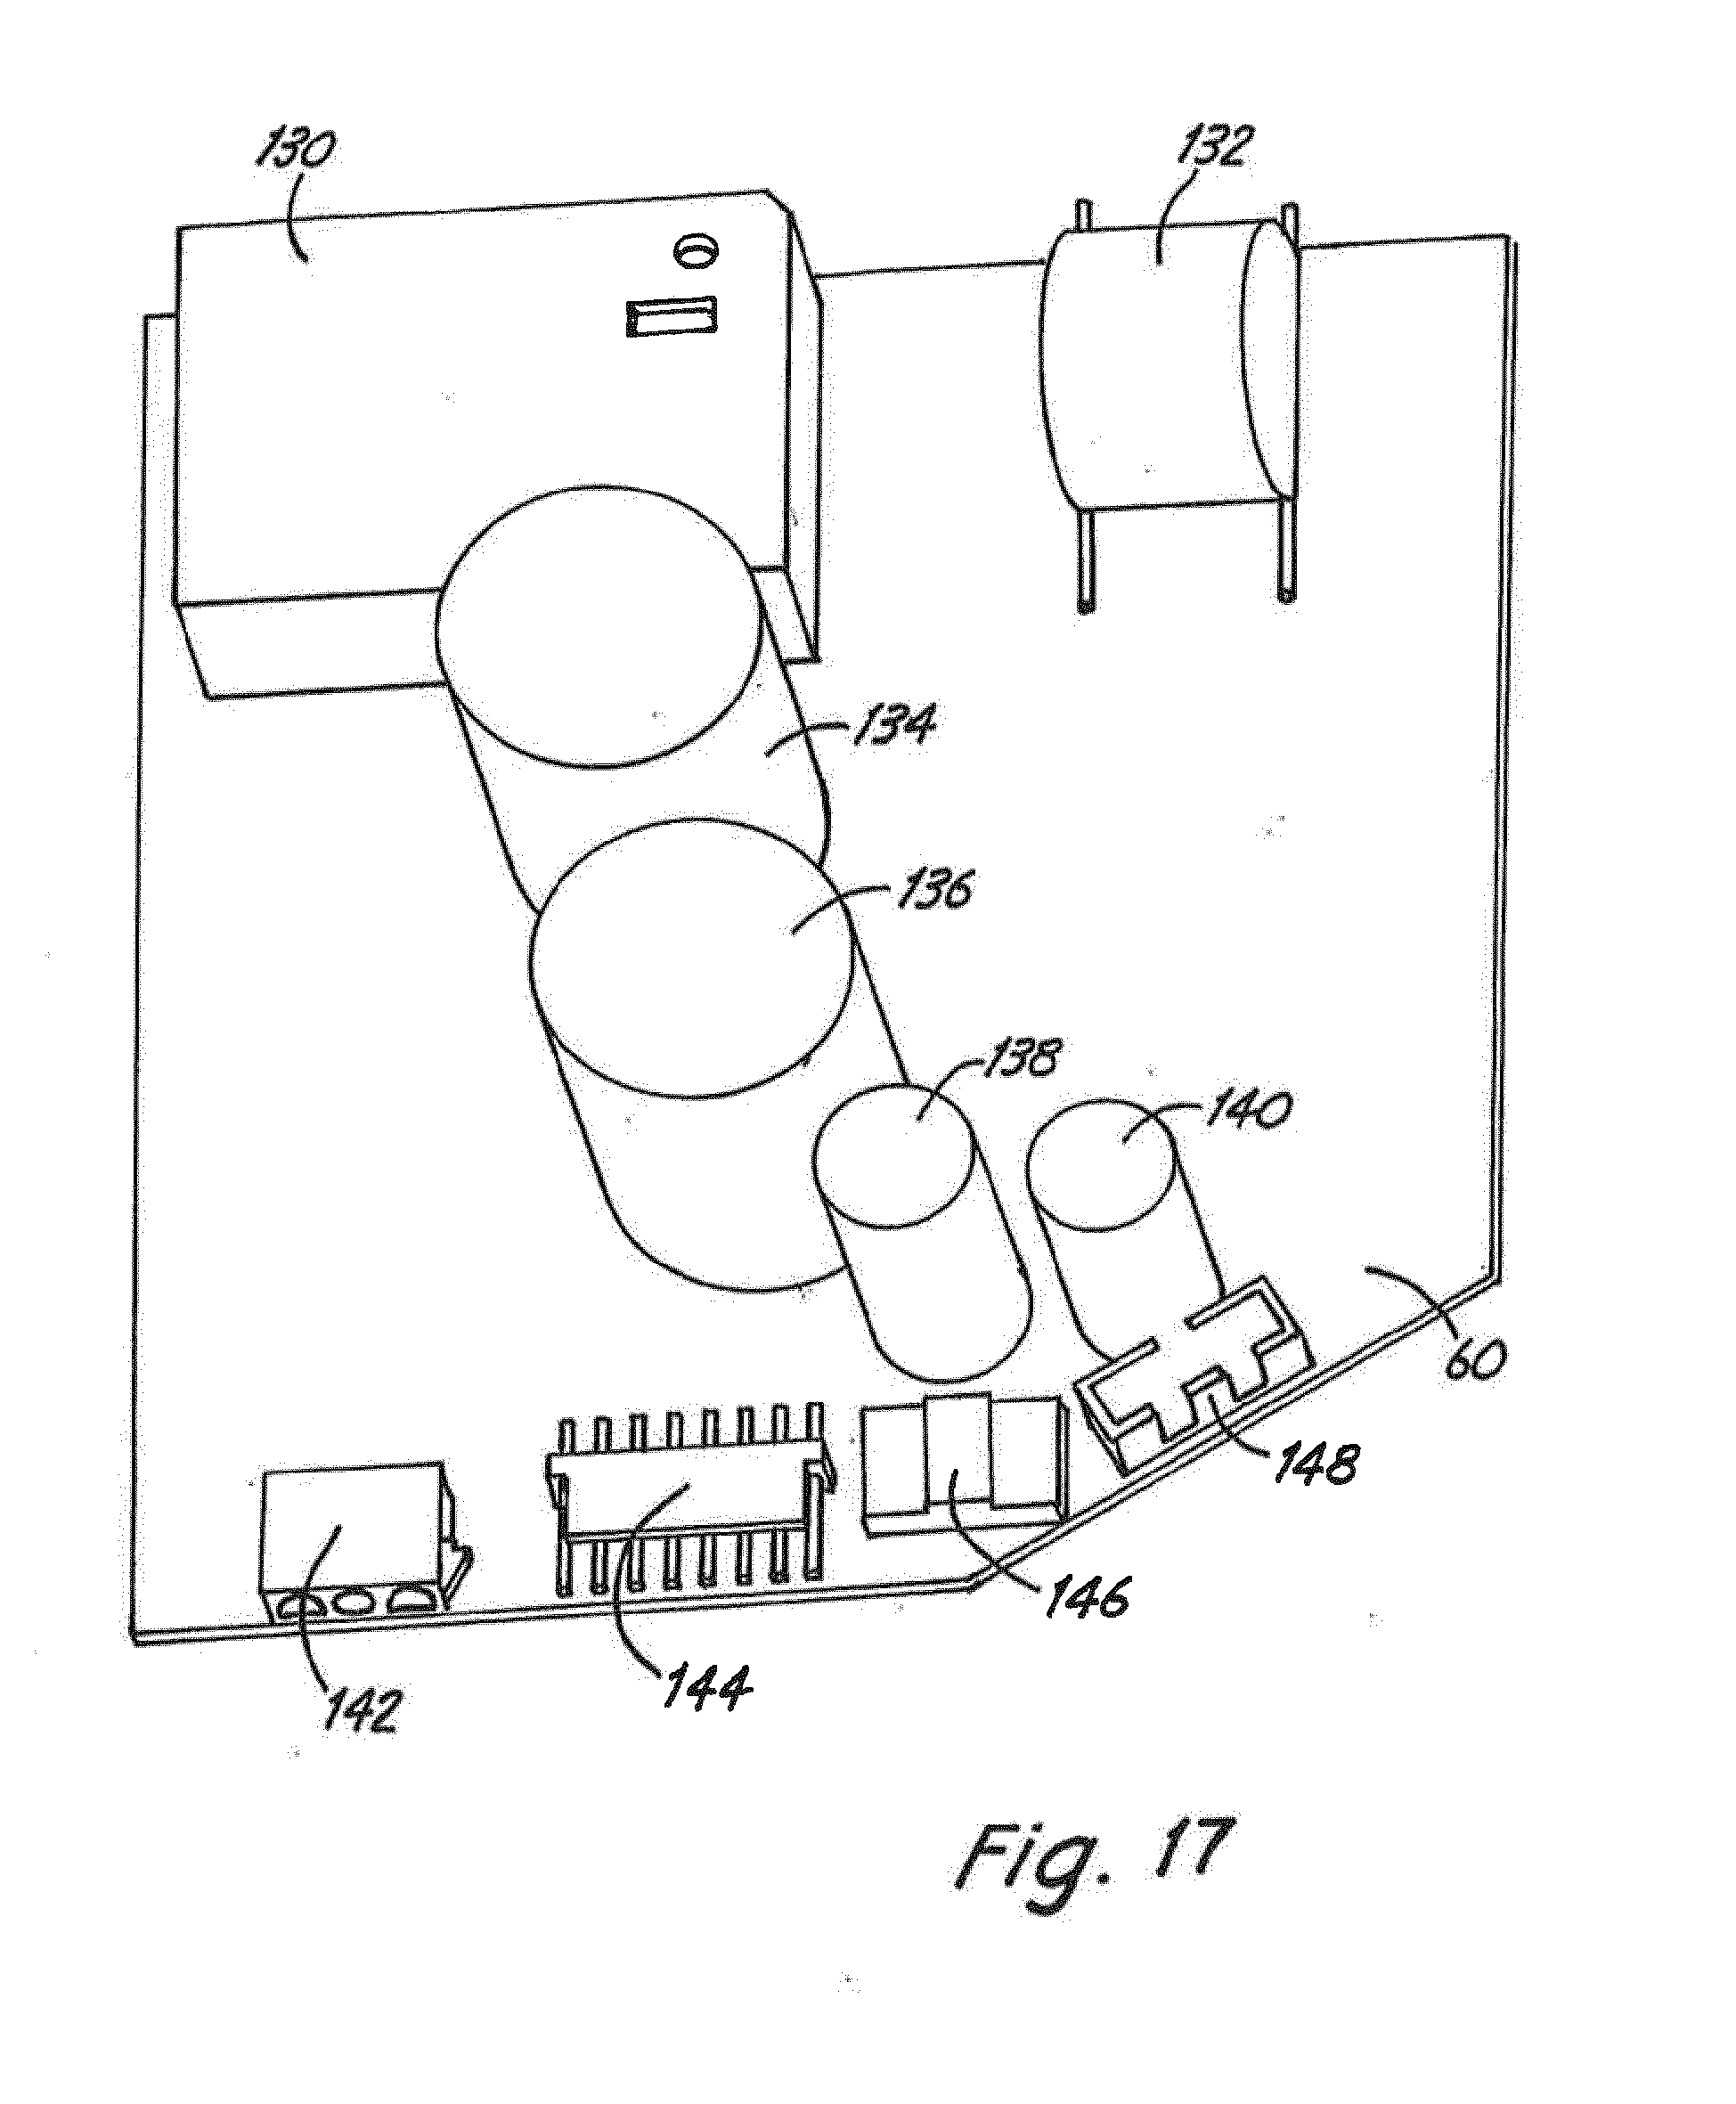 patent ep2520268a1